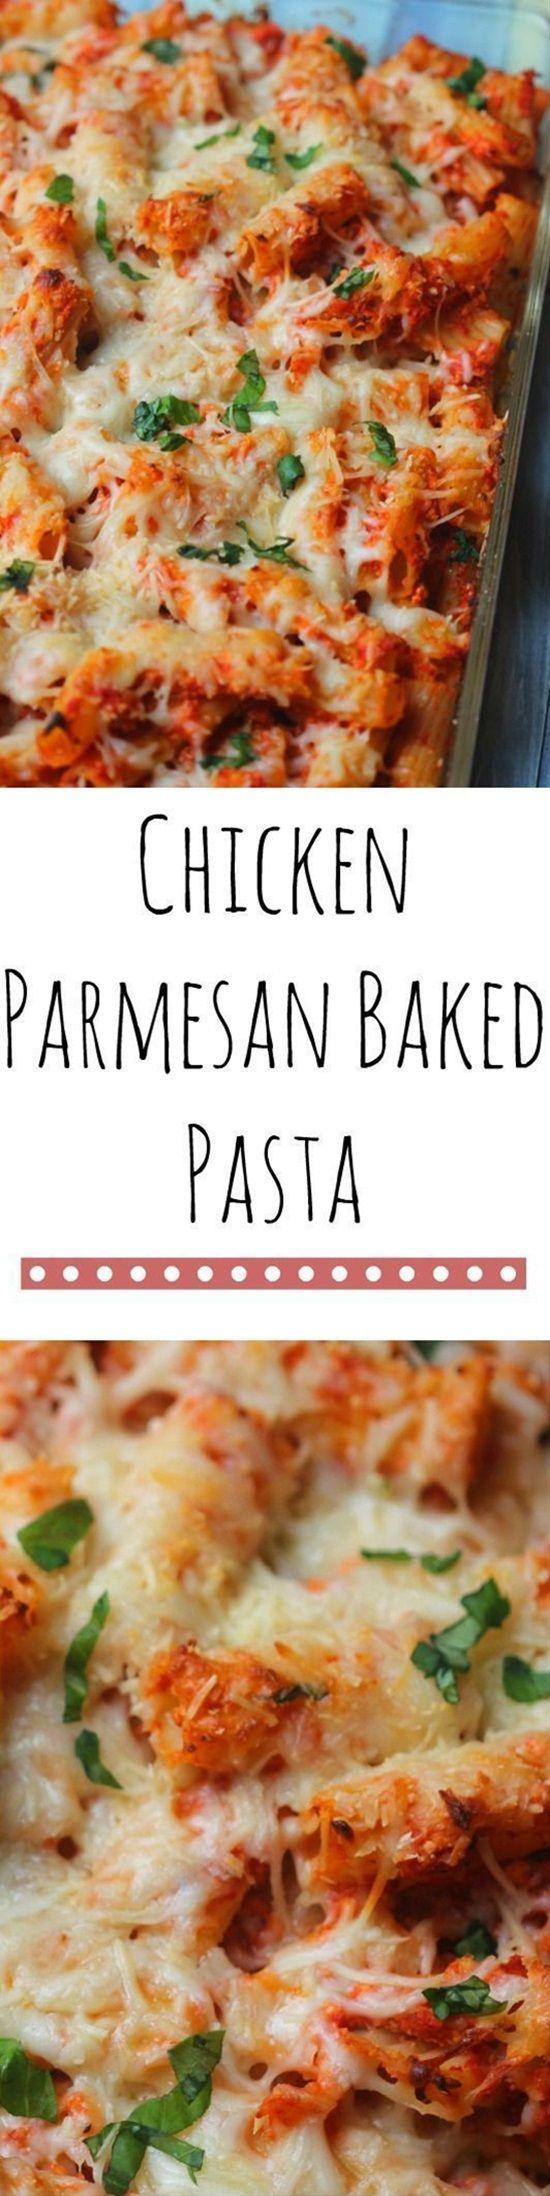 Chicken Parmesan Baked Pasta